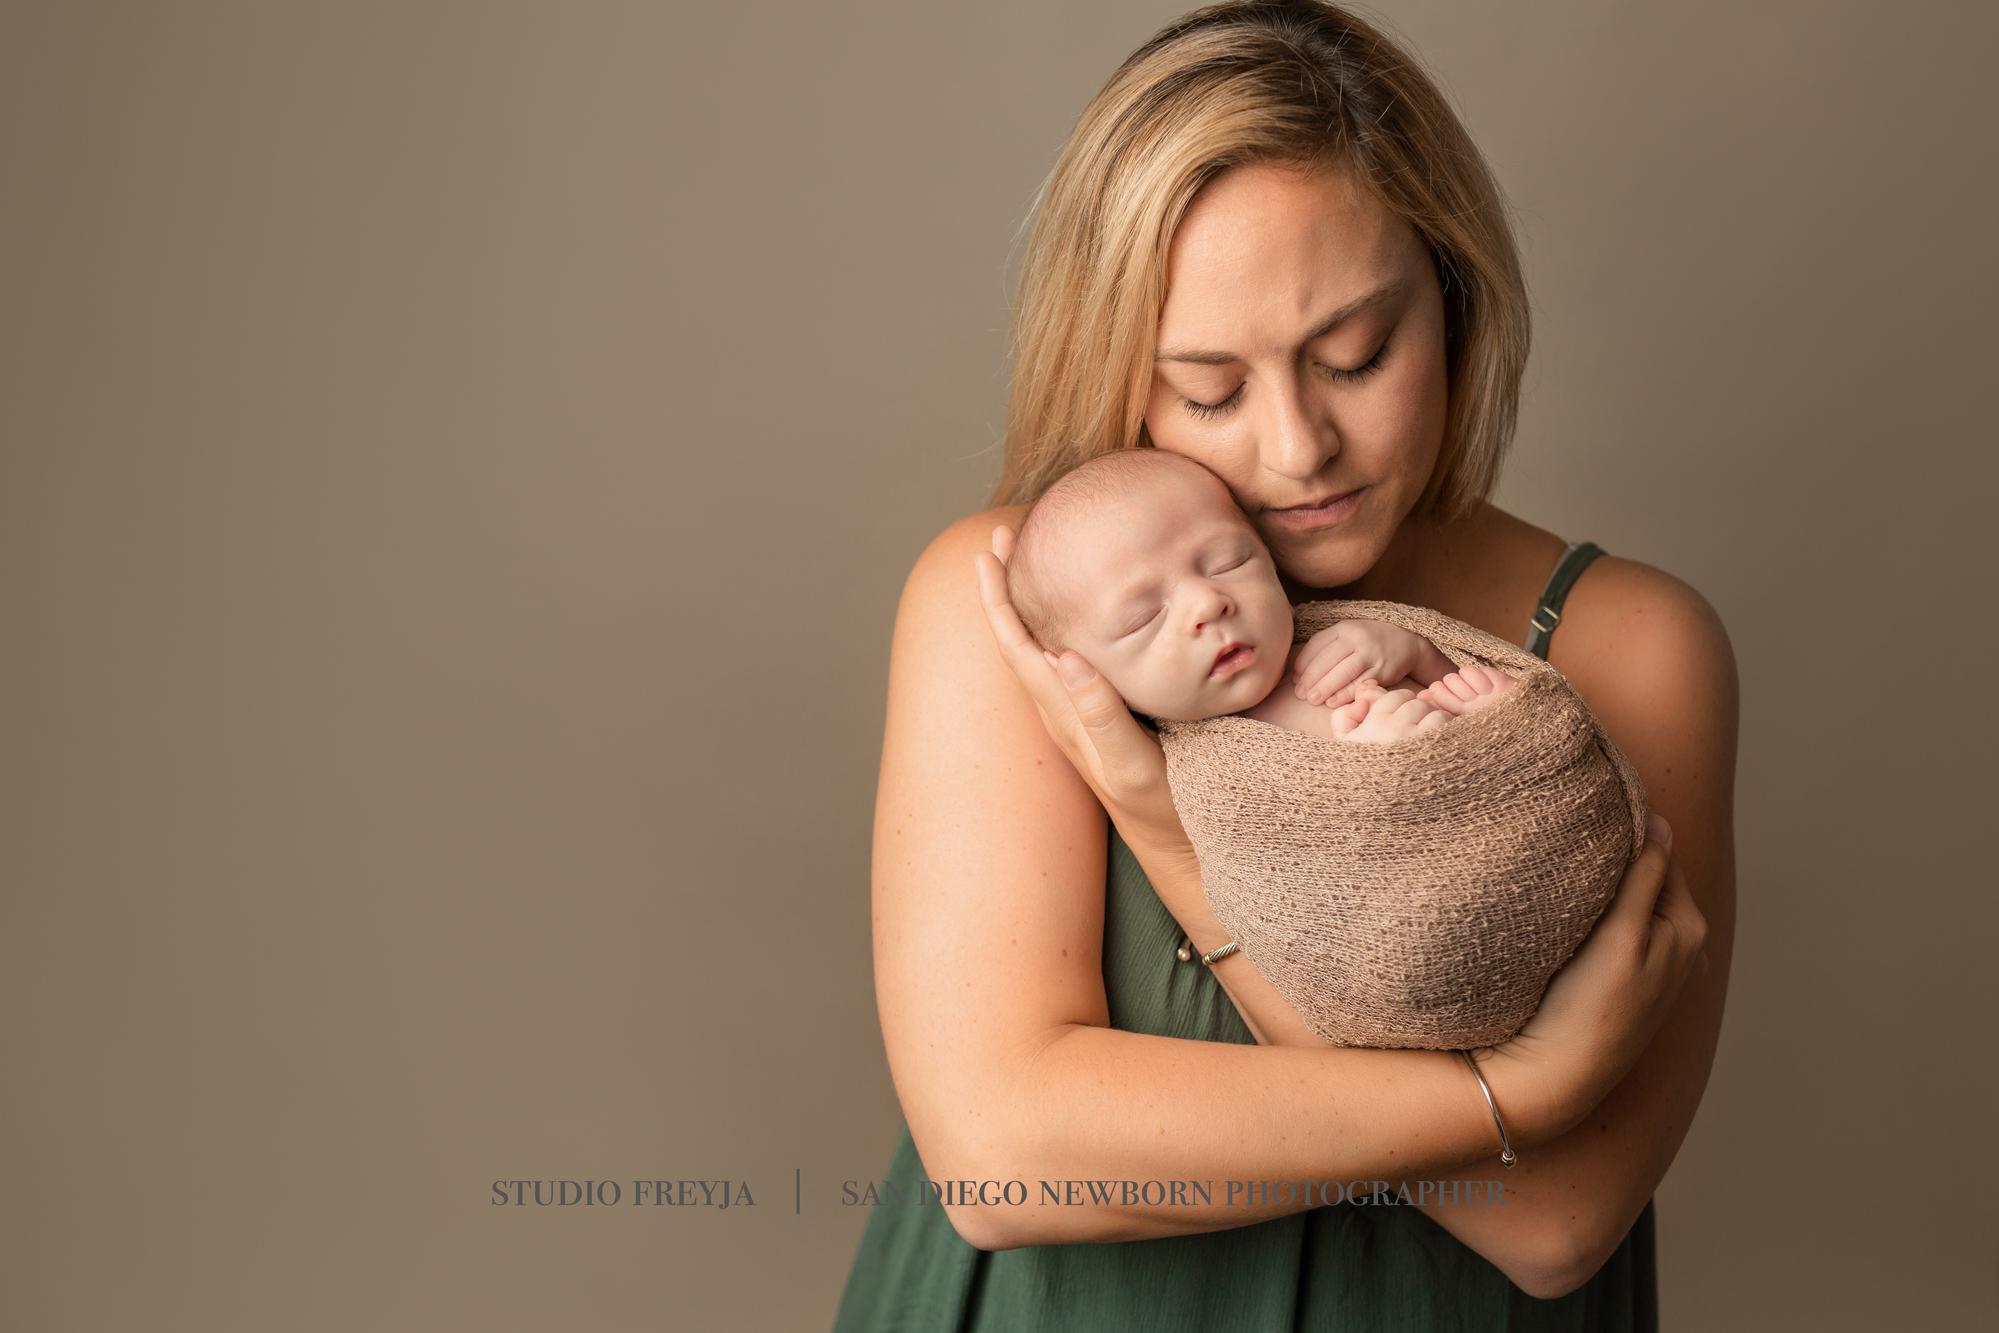 Ronan Newborn Pictures Copyright Studio Freyja (37 of 50).jpg